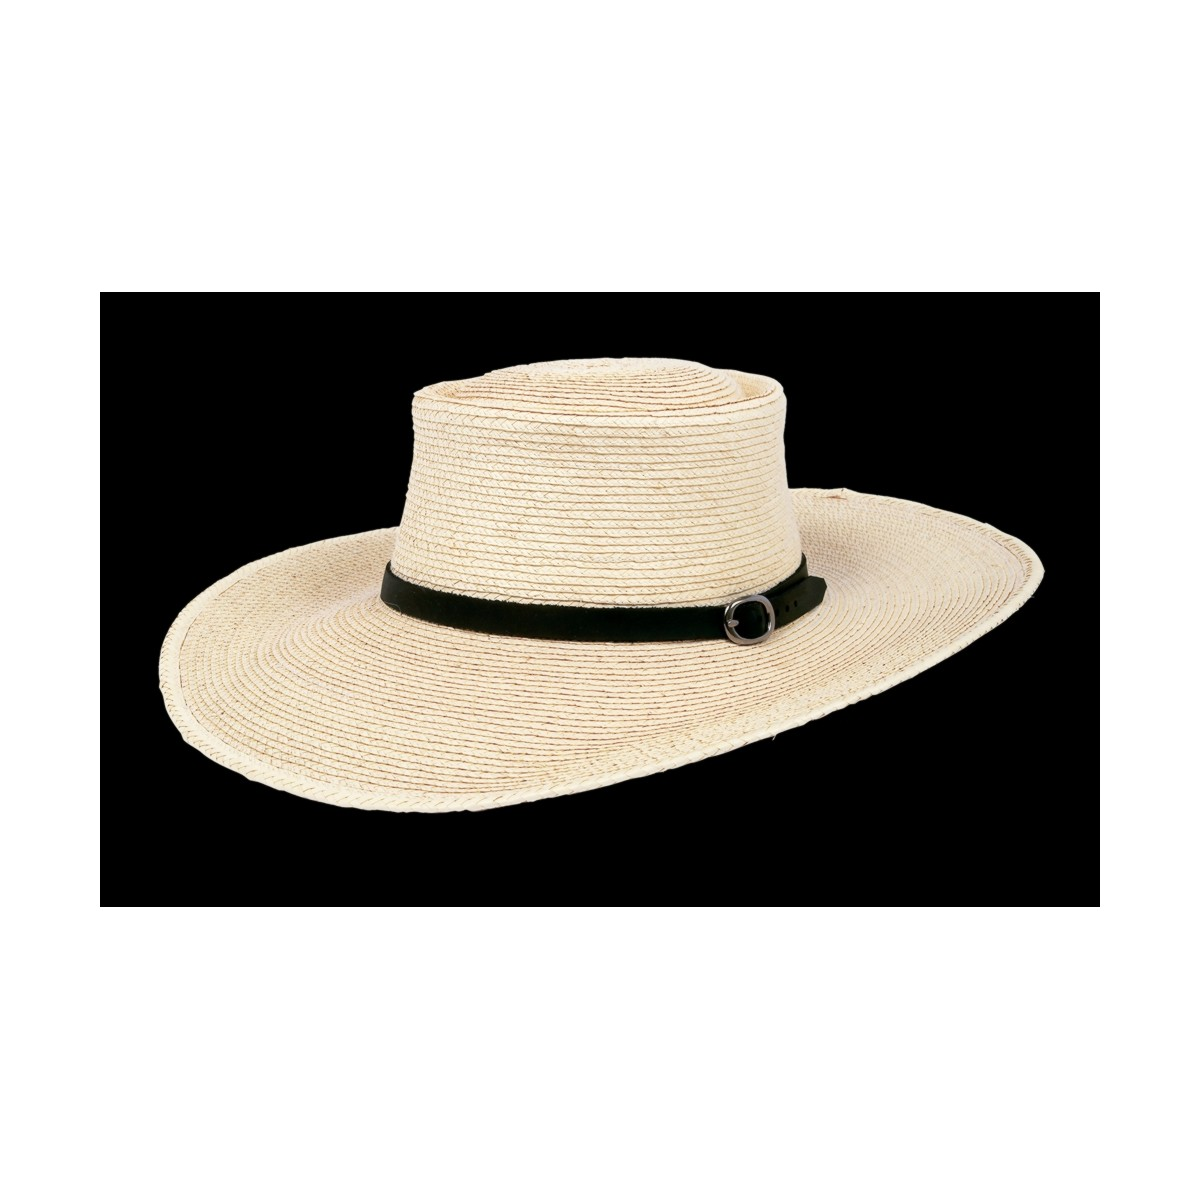 SUNBODY HATS - Bottega del cavallo 1e556d6c3db3